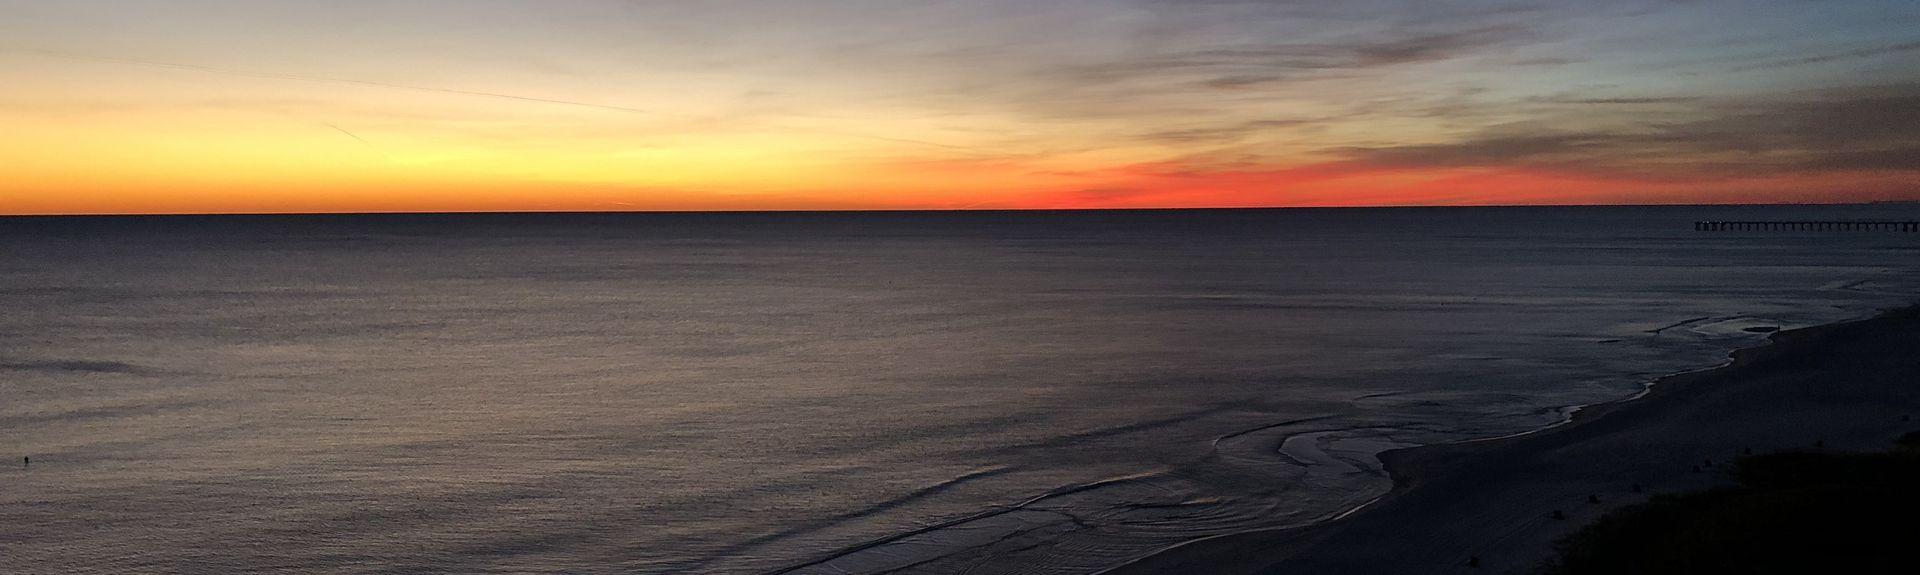 Emerald Beach (Panama City Beach, Florida, United States)